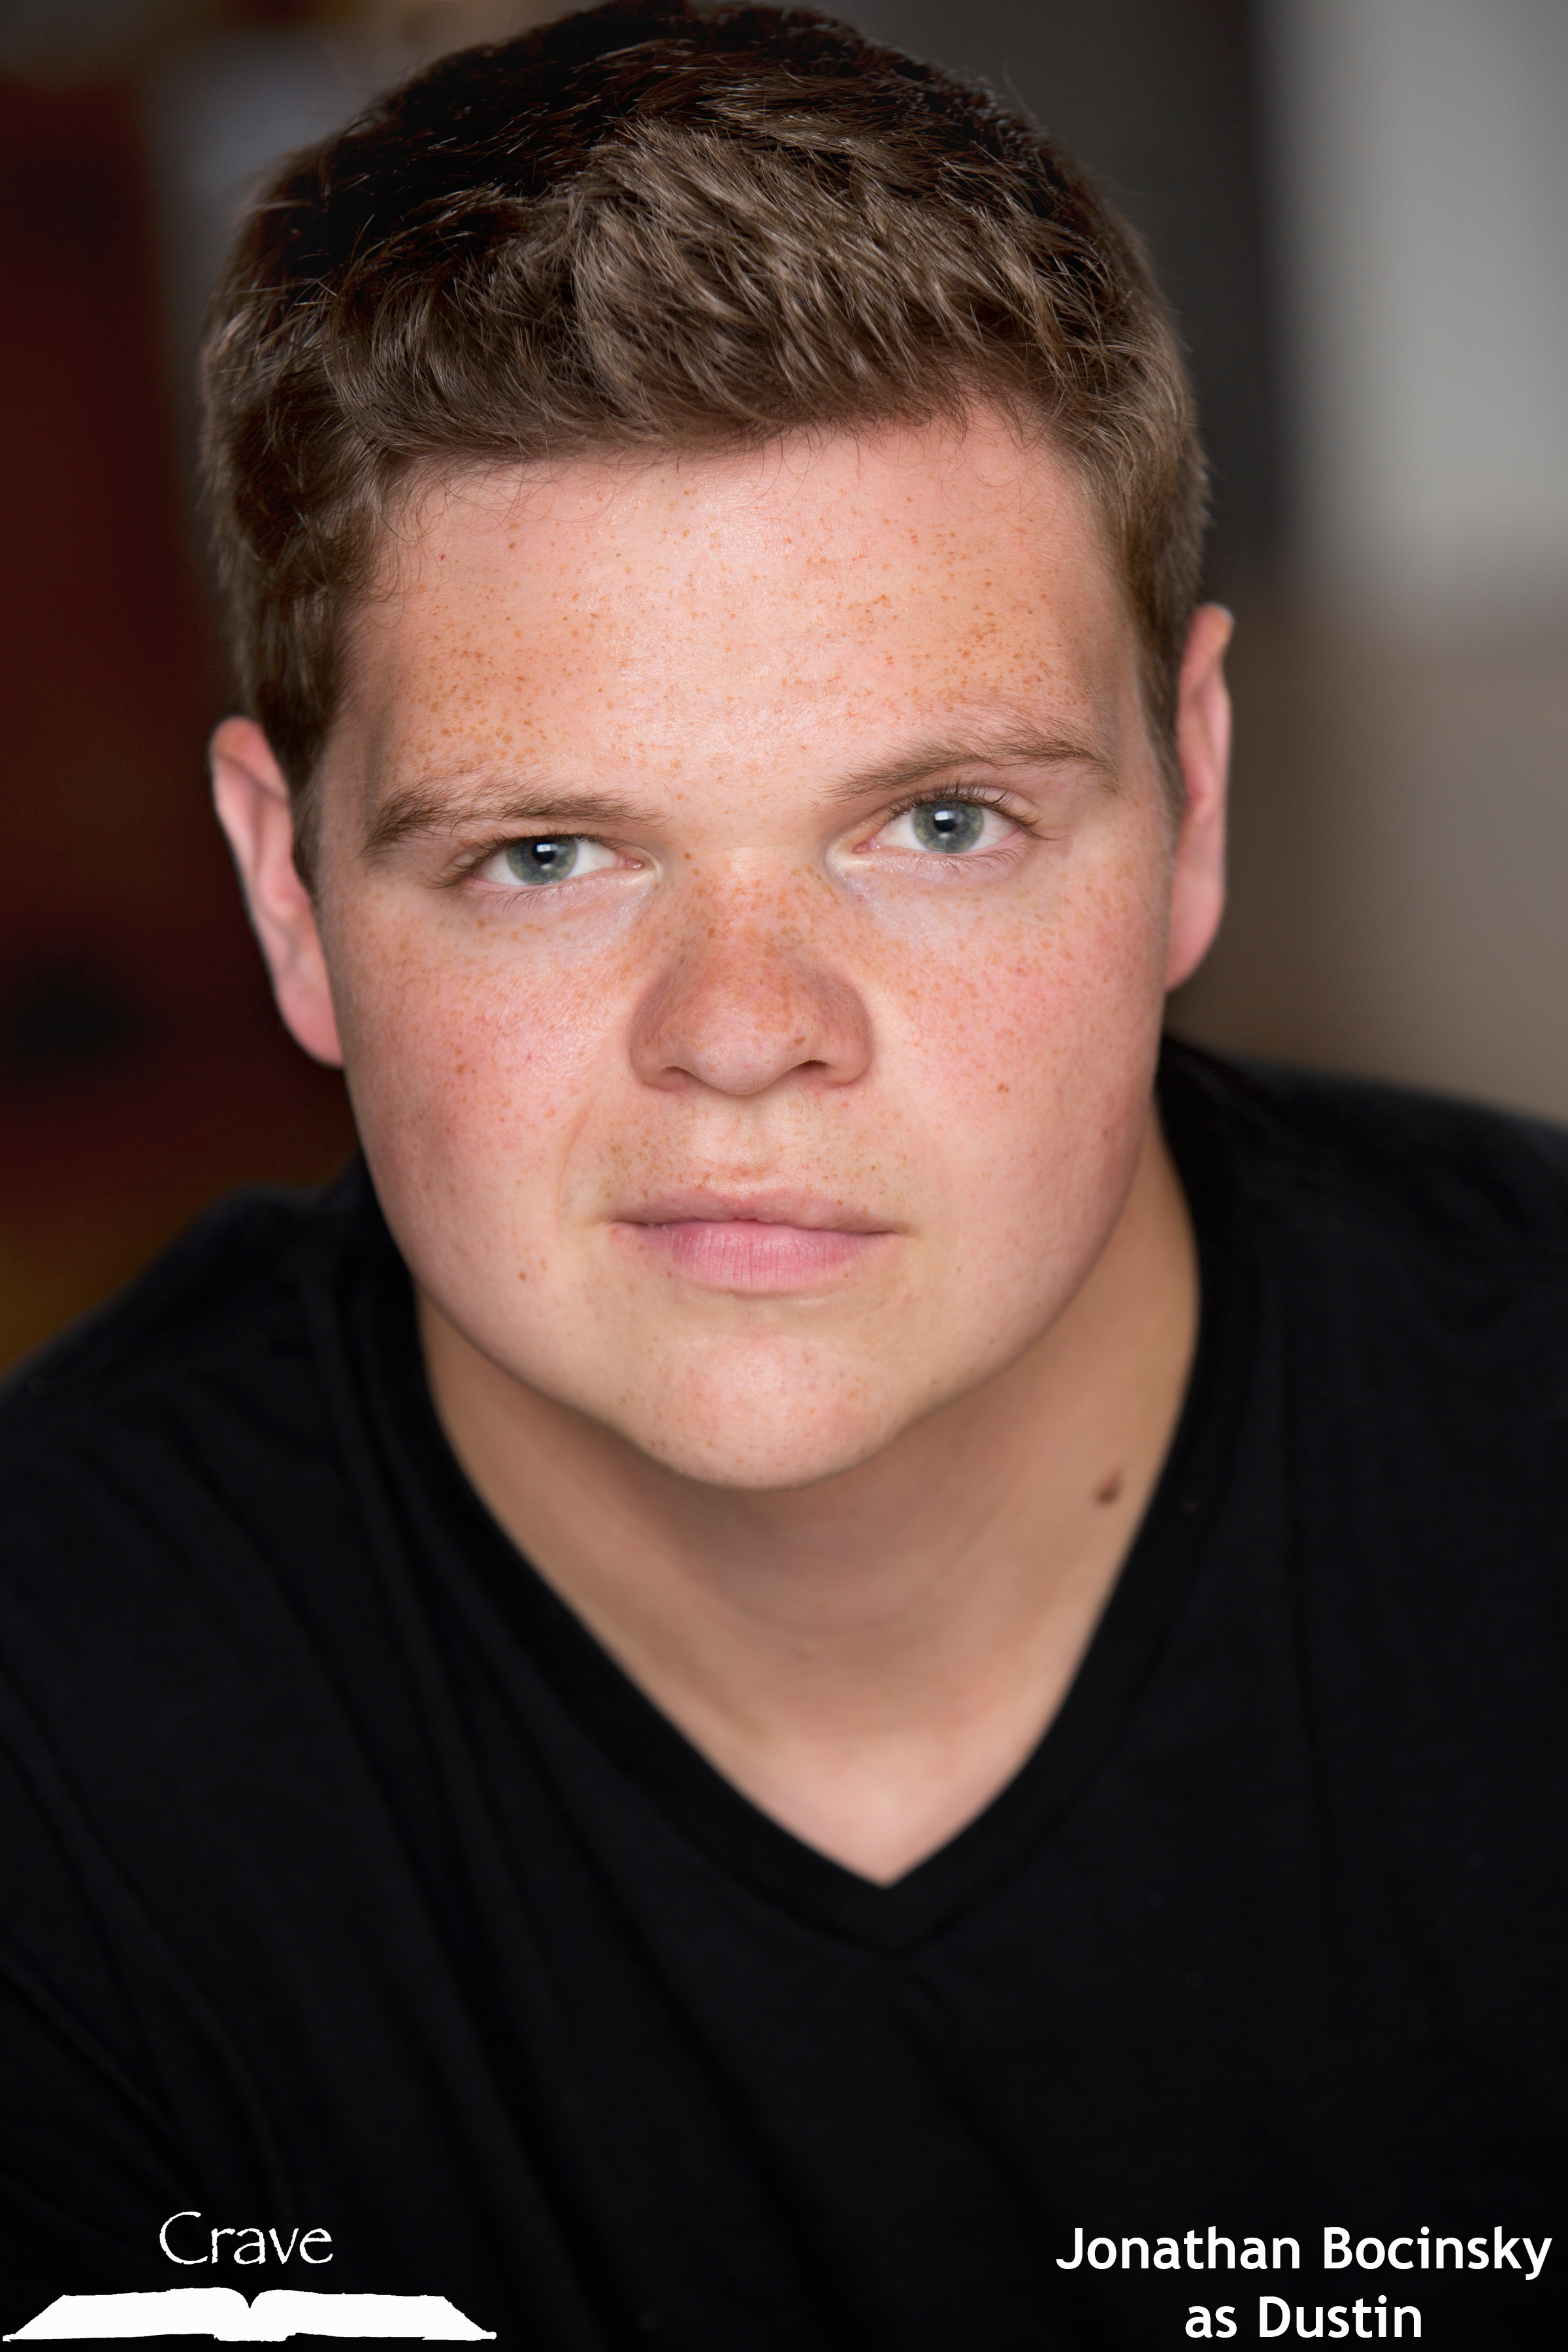 Jonathan Bocinsky - Dustin